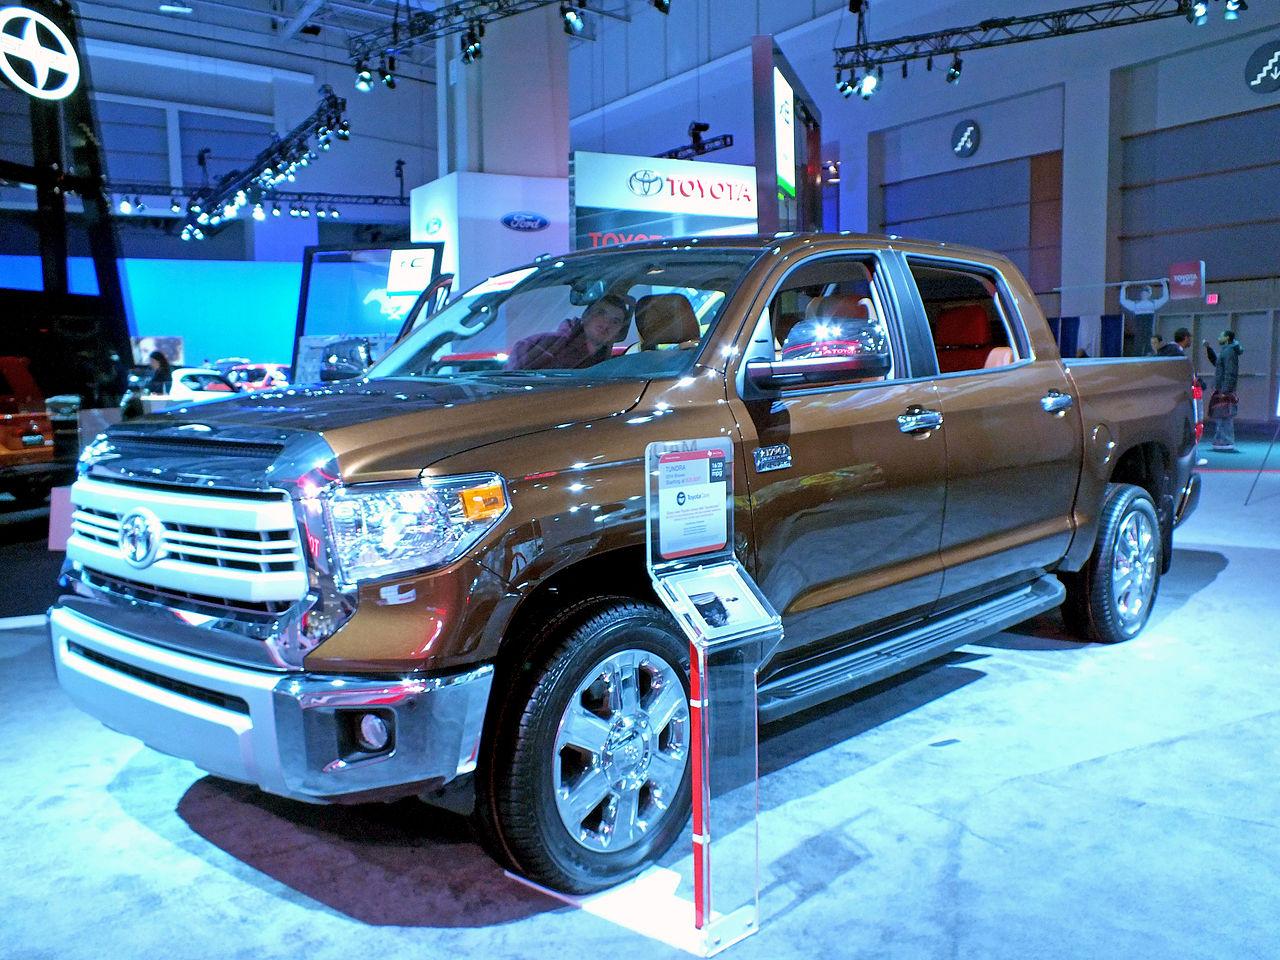 Next Generation Toyota Tundra - Date? | Toyota Truck Club